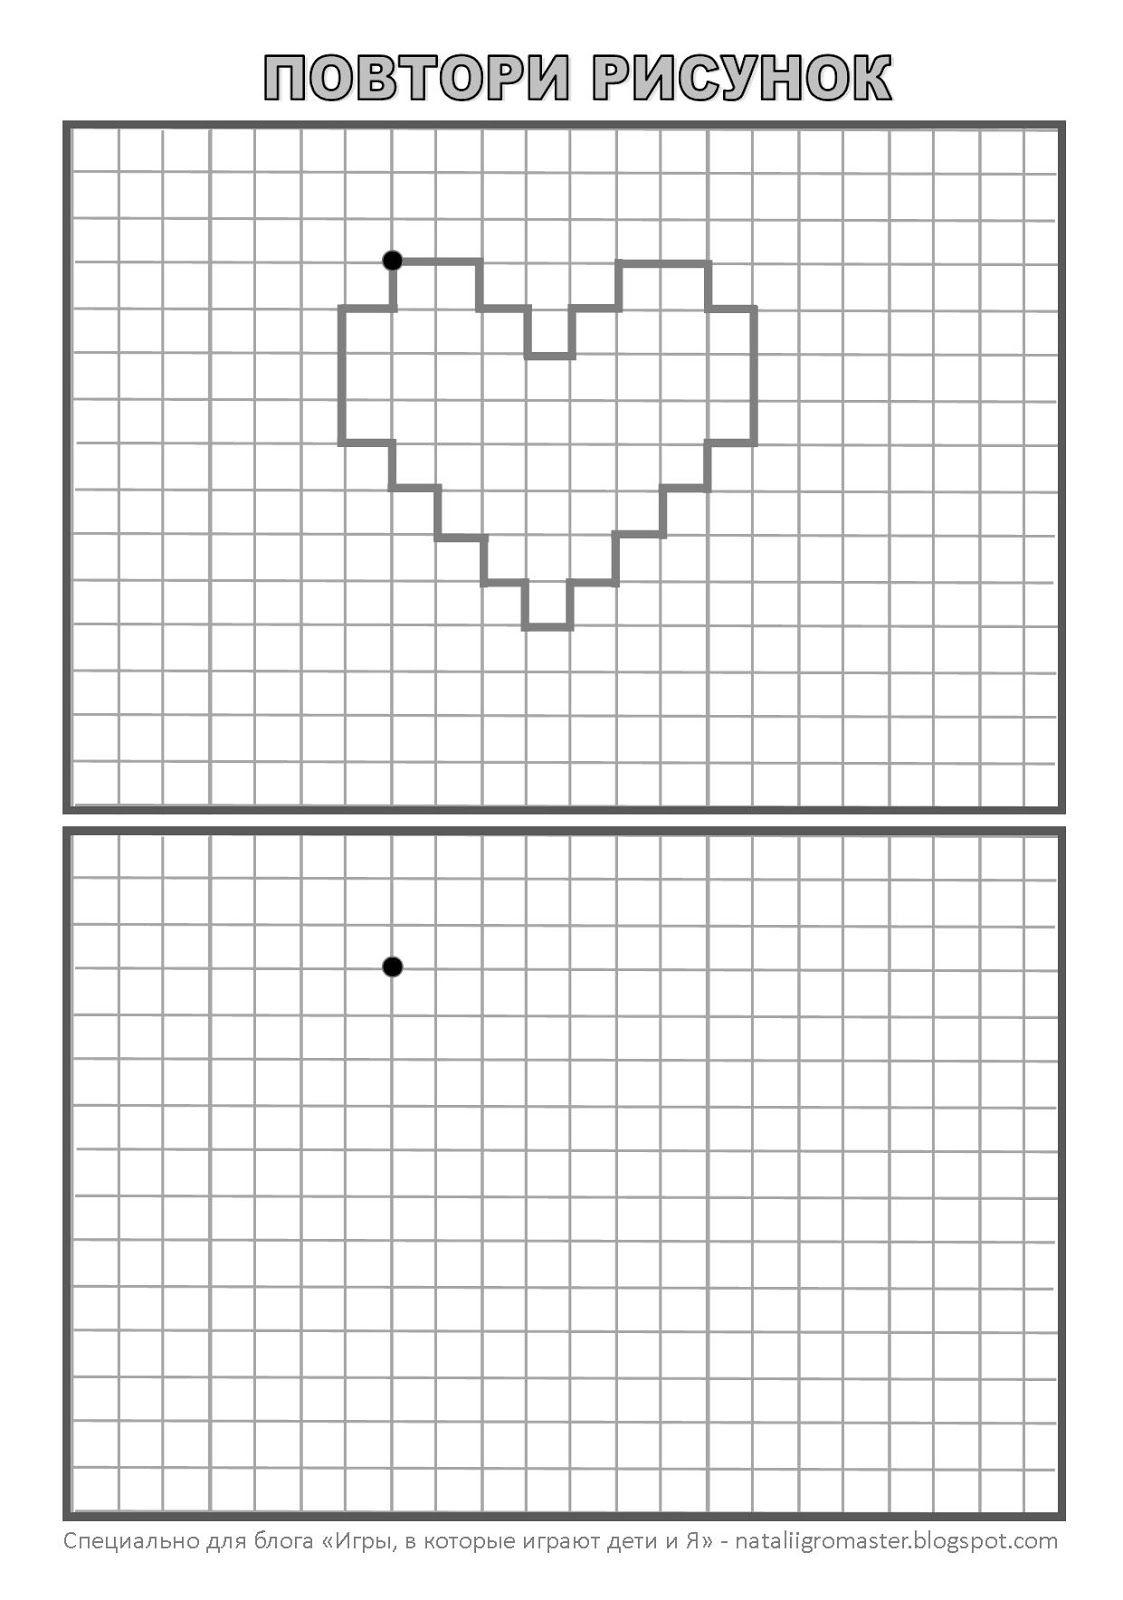 Encryptie-DECODEREN-POVTORYALKI - Print en Draw :: Games die kinderen spelen en ik